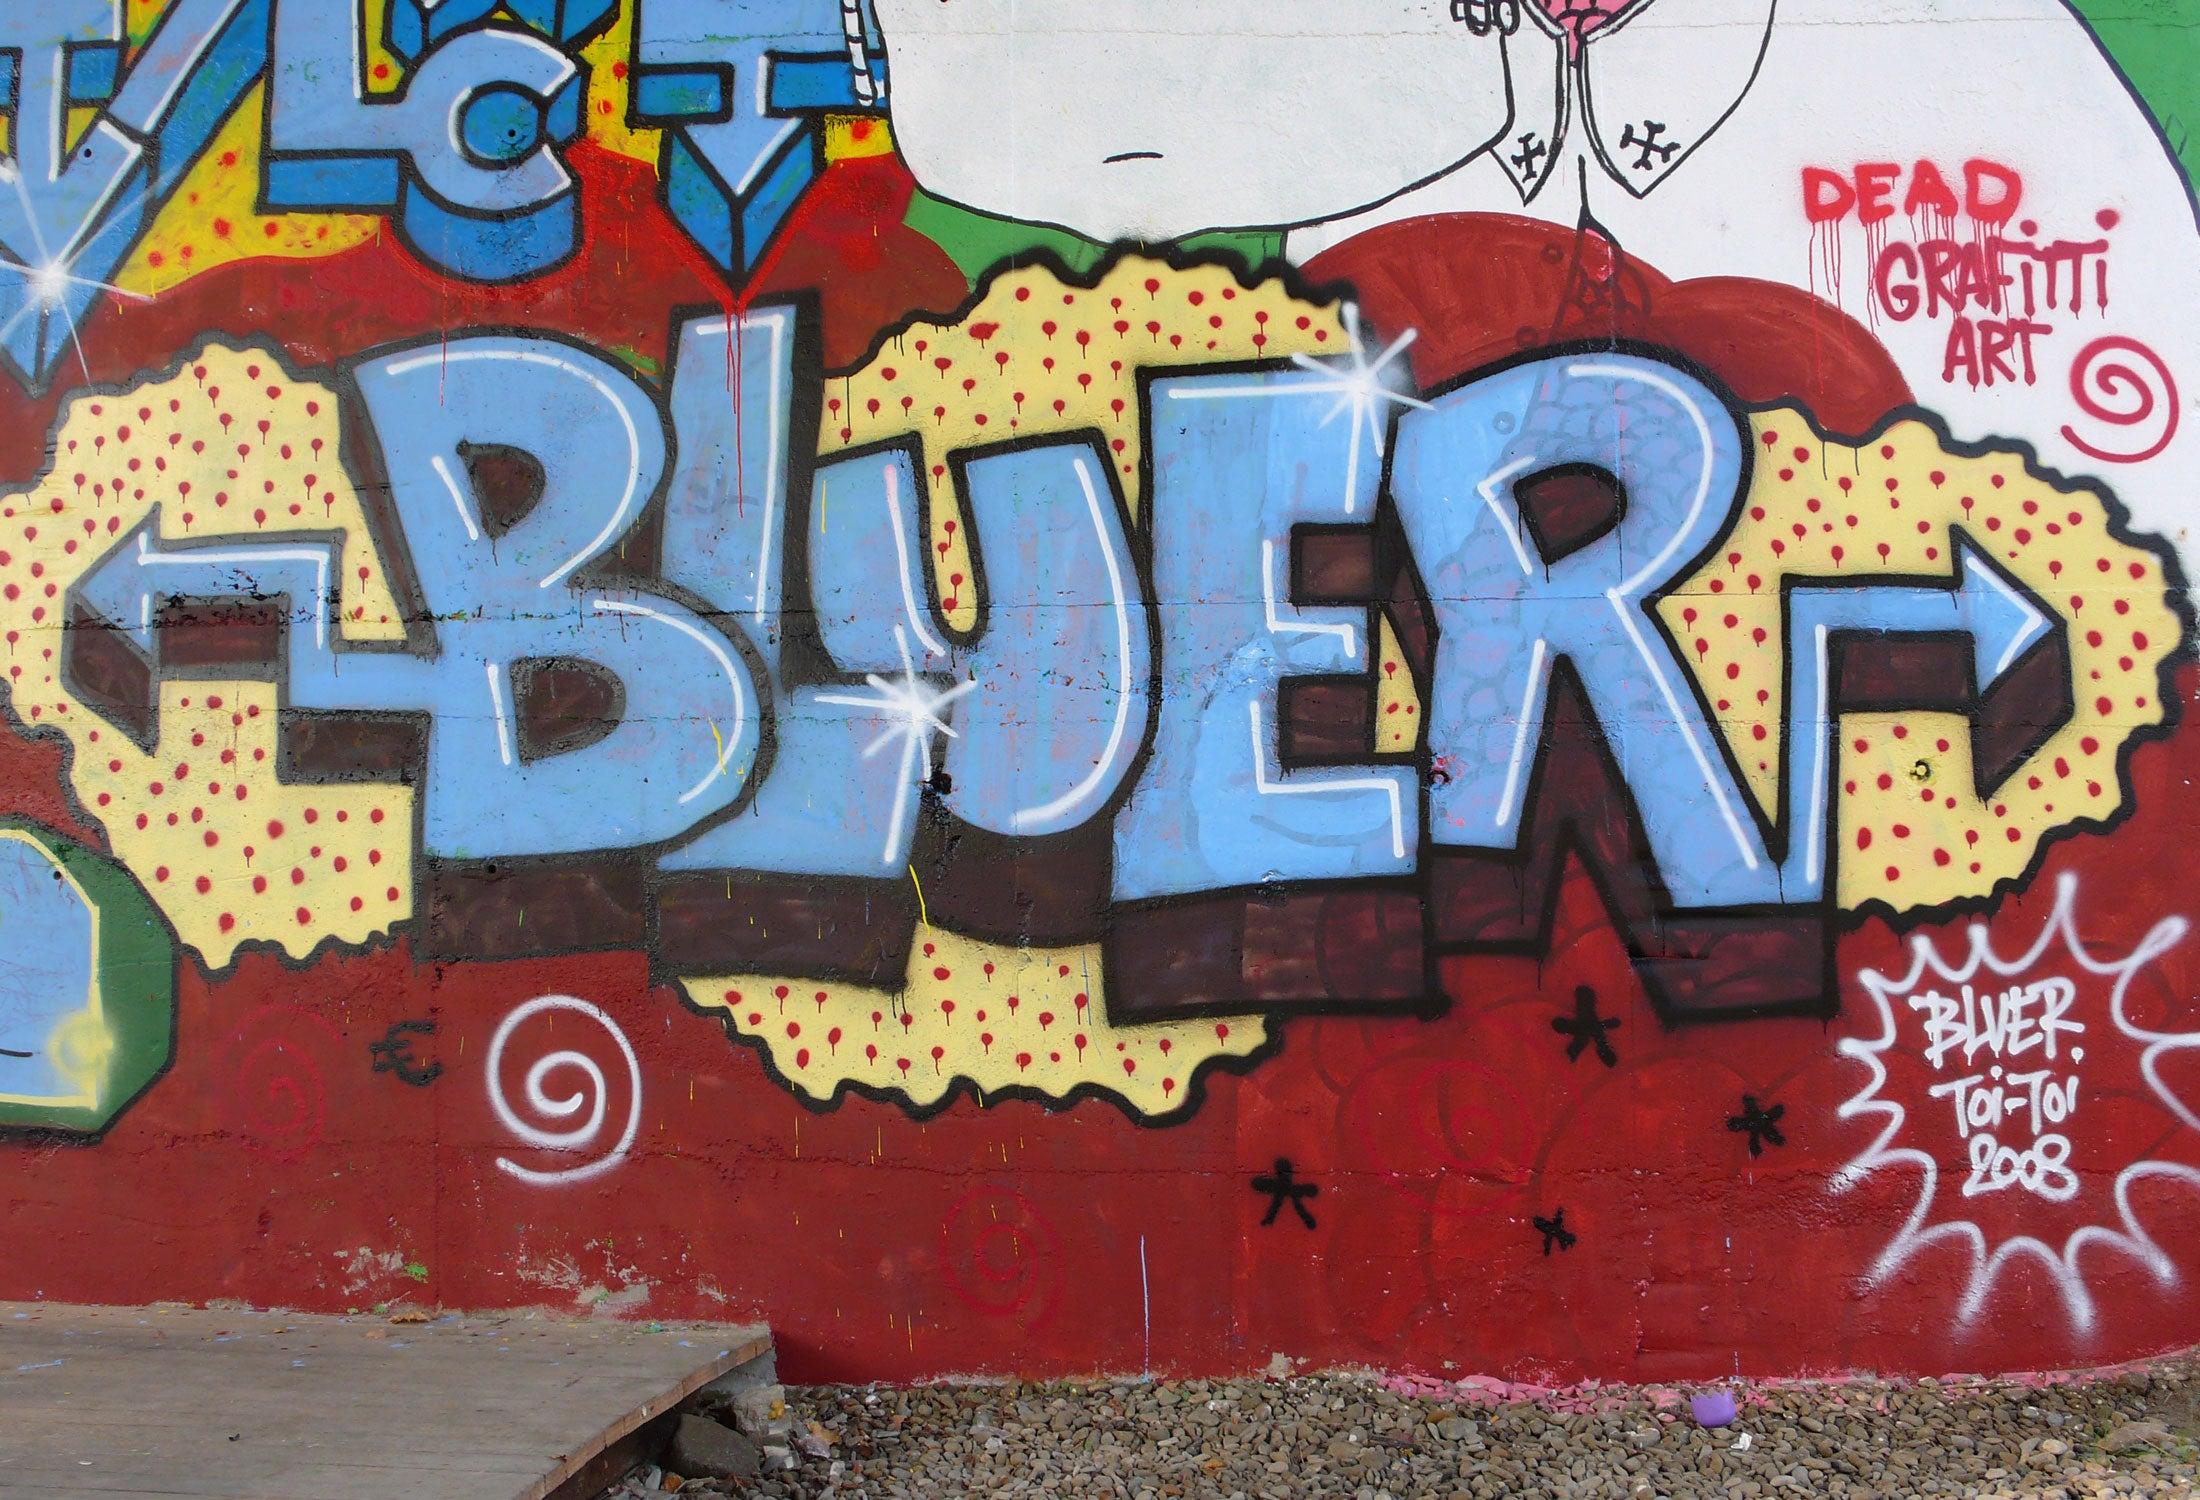 Bluer_19.jpg